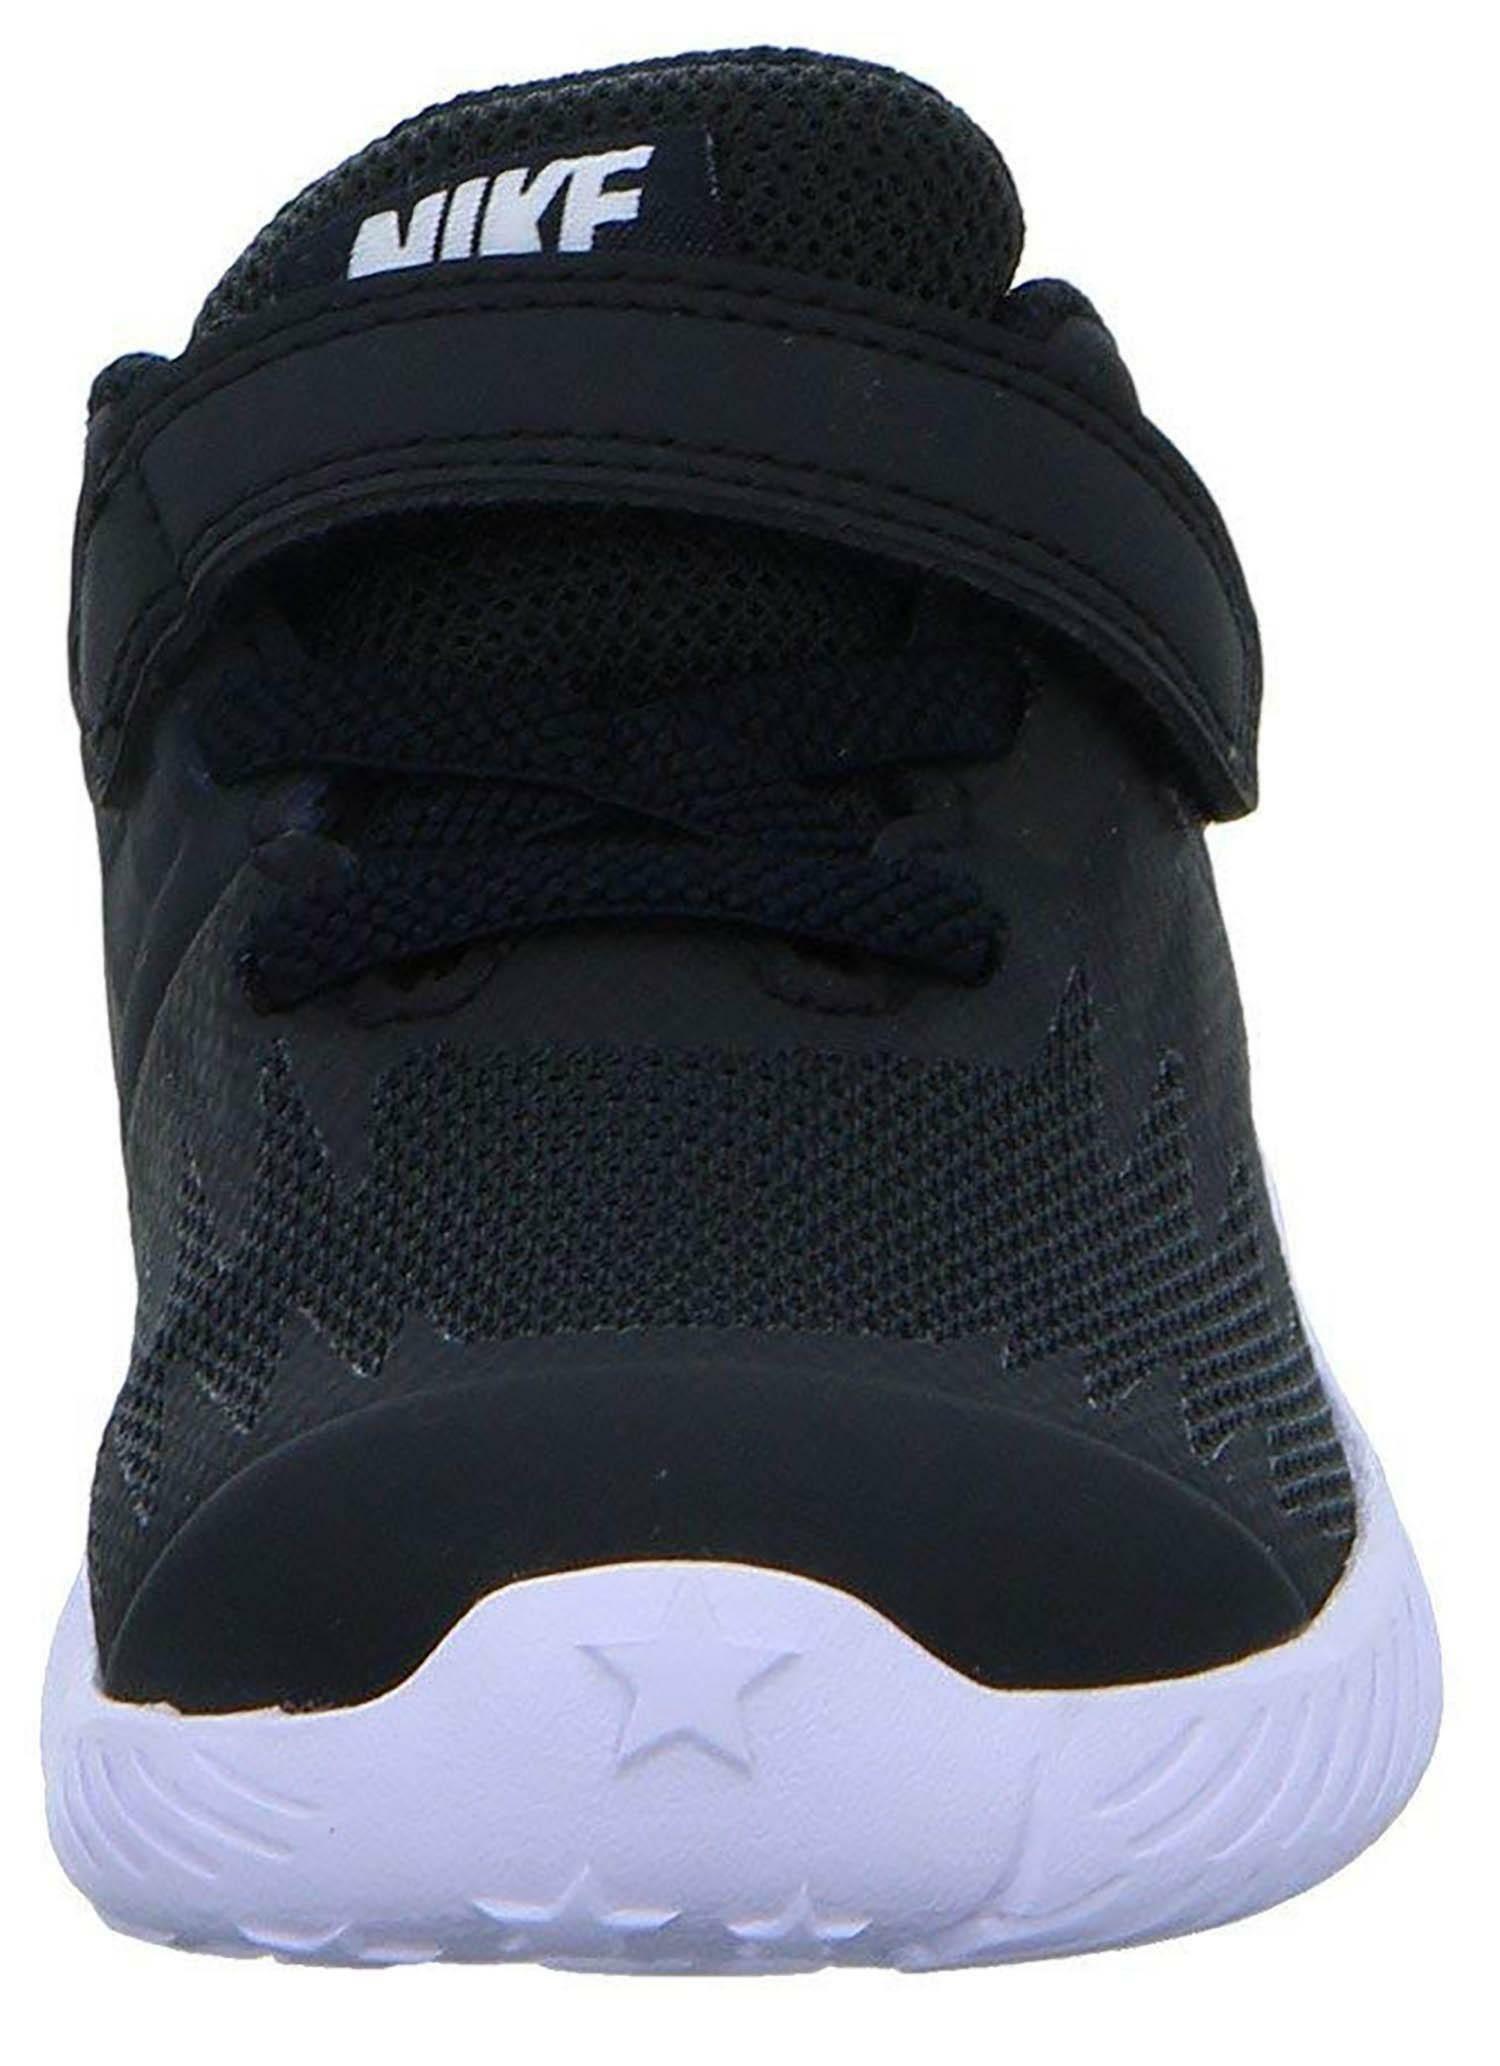 scarpe sportive bambino 34 nike